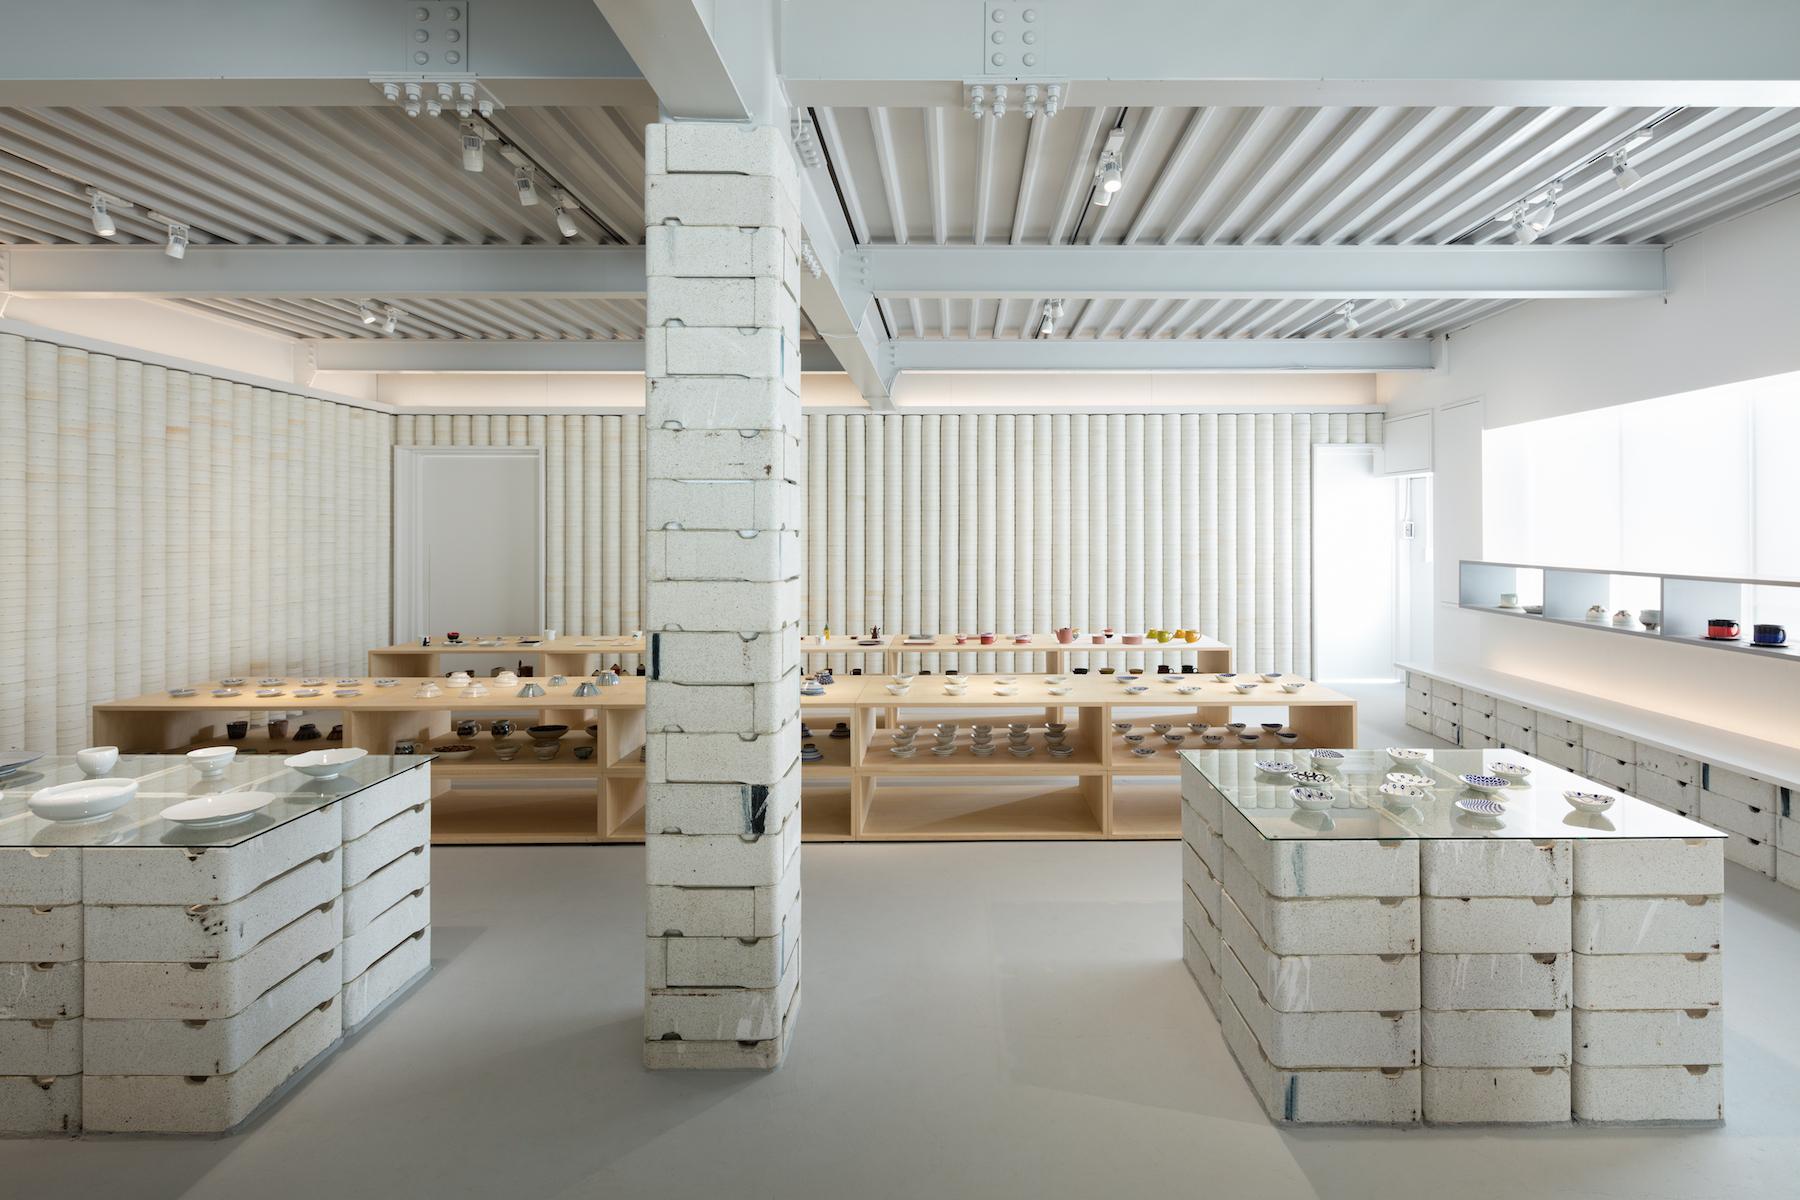 Keramik Shop Oyane von DO.DO.